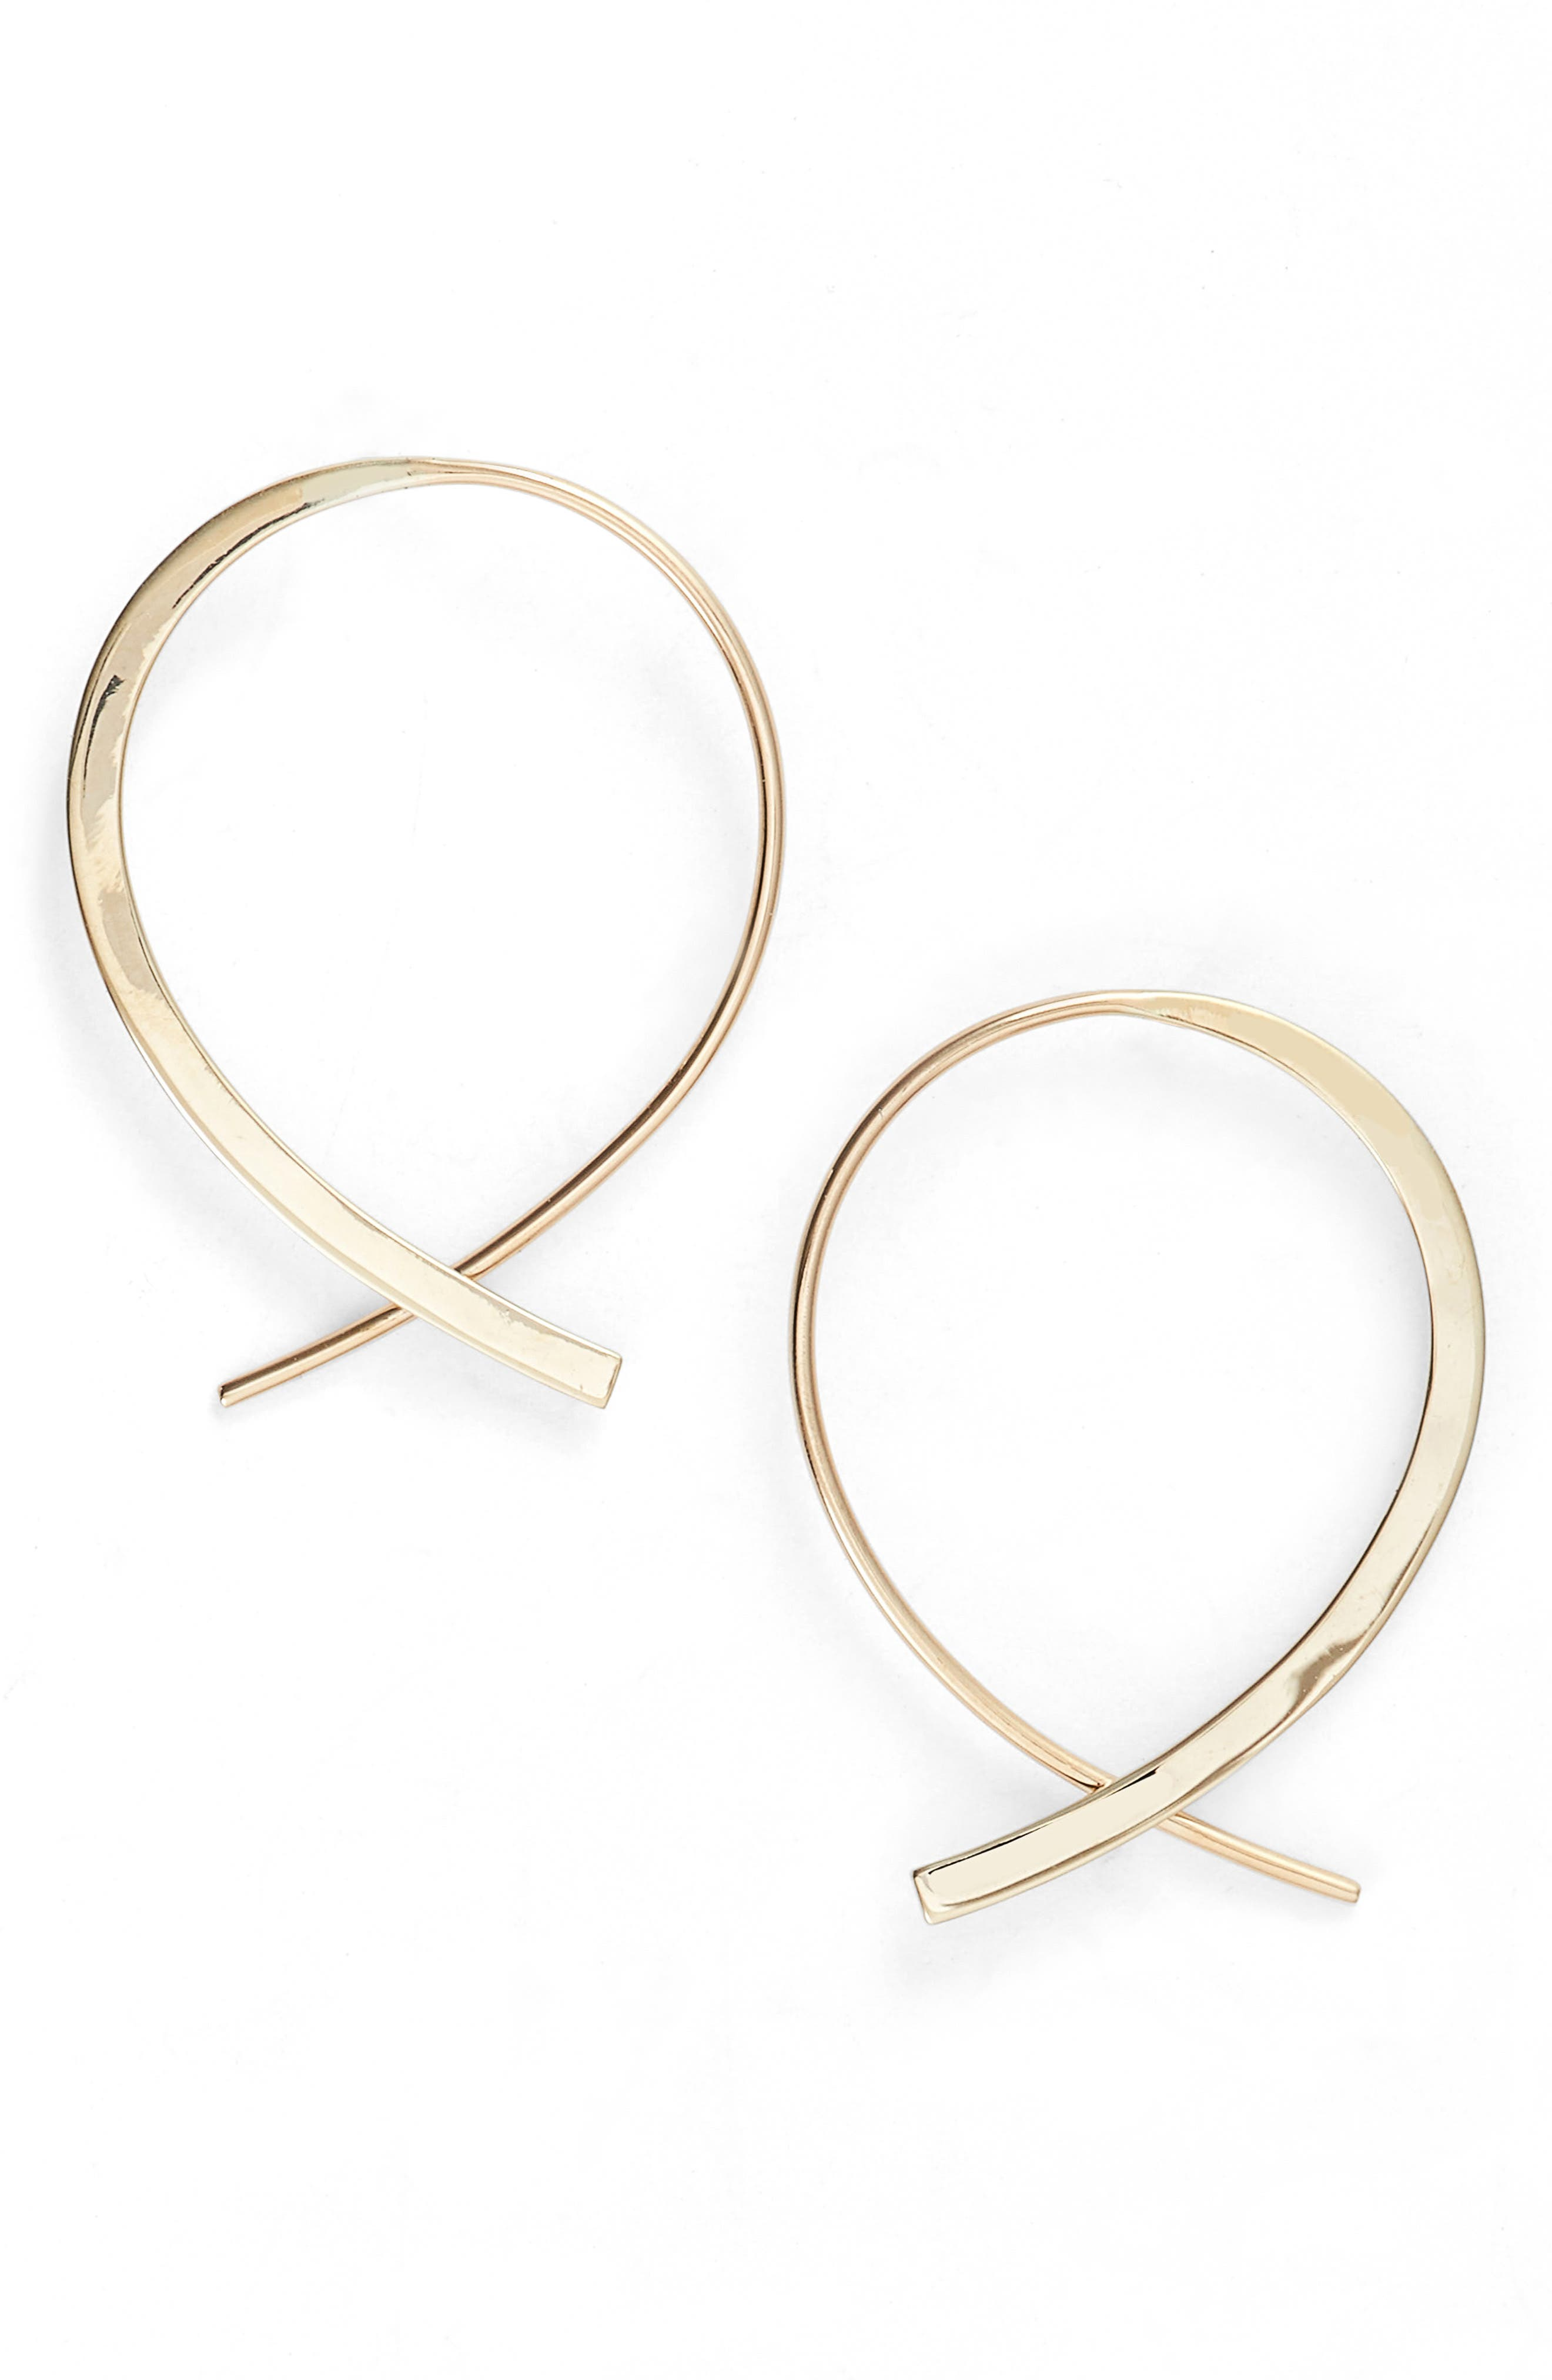 Main Image - Lana Jewelry Small Frontal Upside Down Hoop Earrings